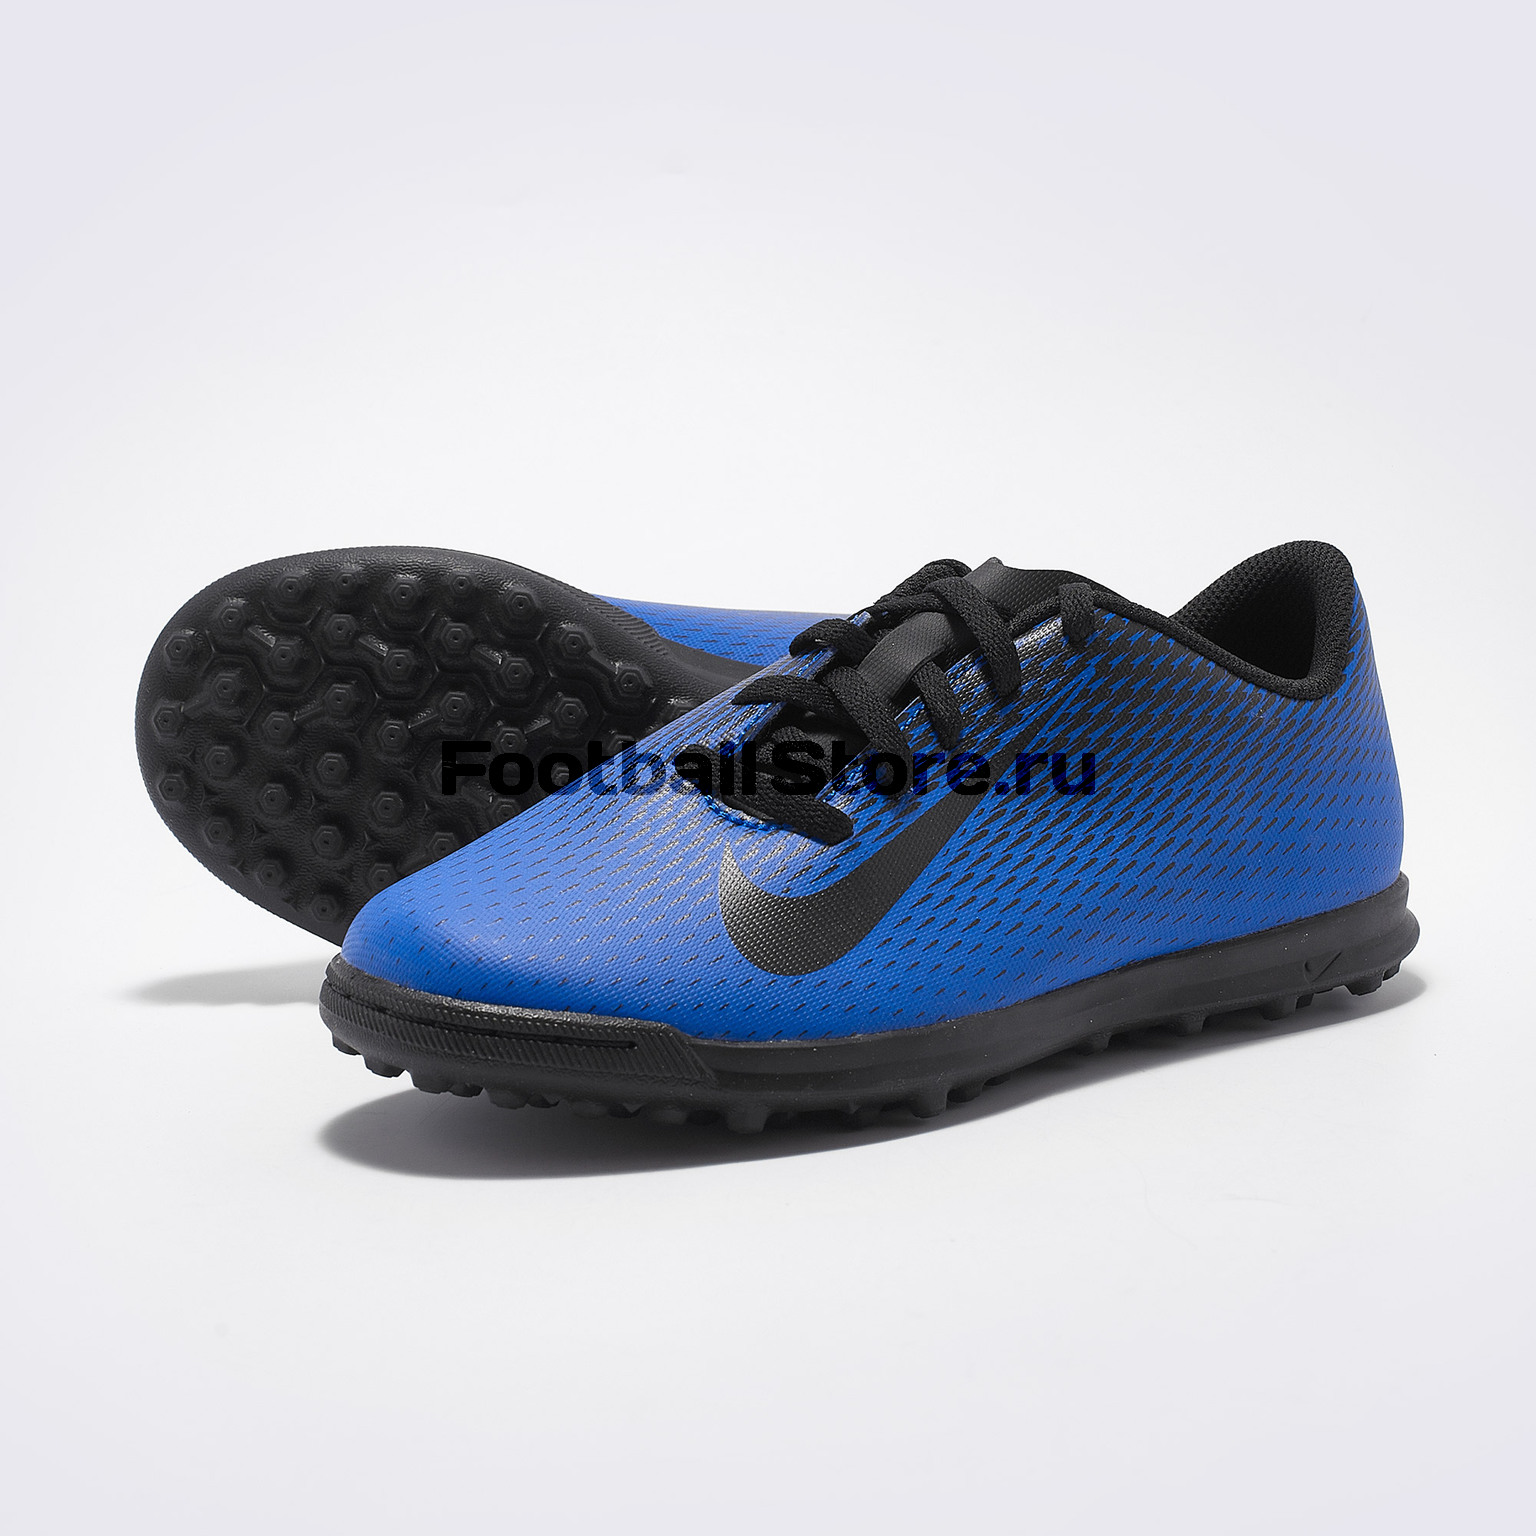 цены на Шиповки детские Nike Bravata II TF 844440-400  в интернет-магазинах